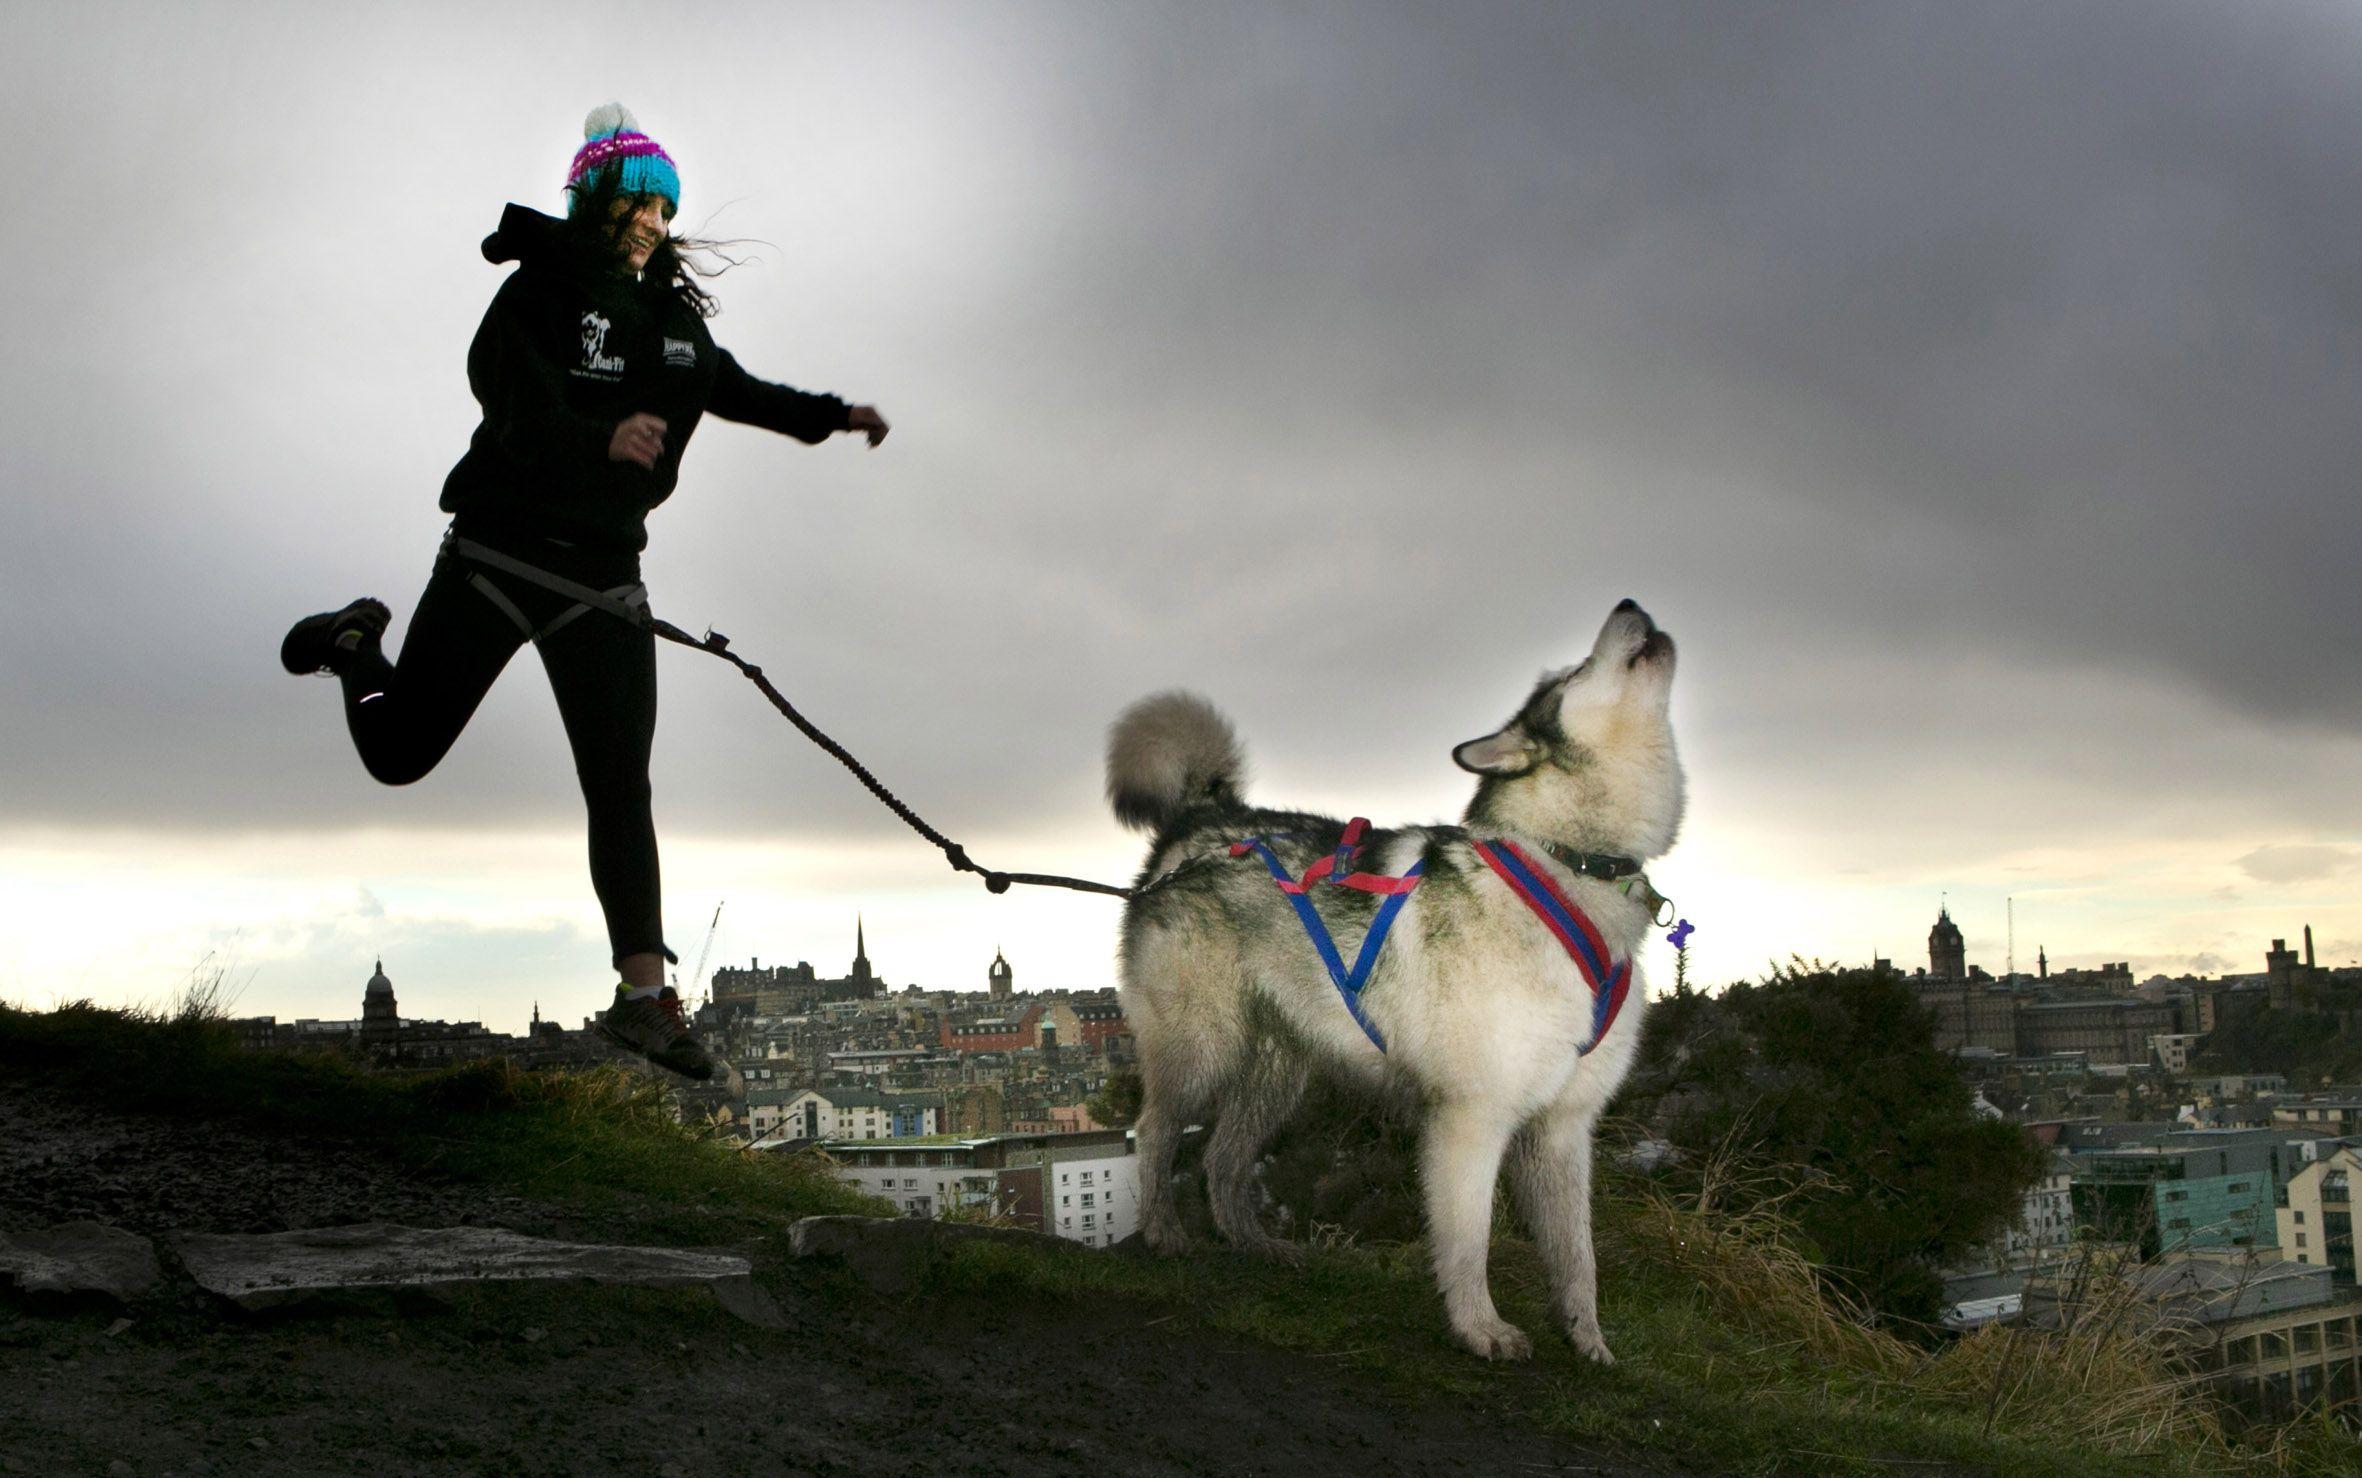 Edinburgh's Dogmanay on 1 January 2013 at Holyrood Park